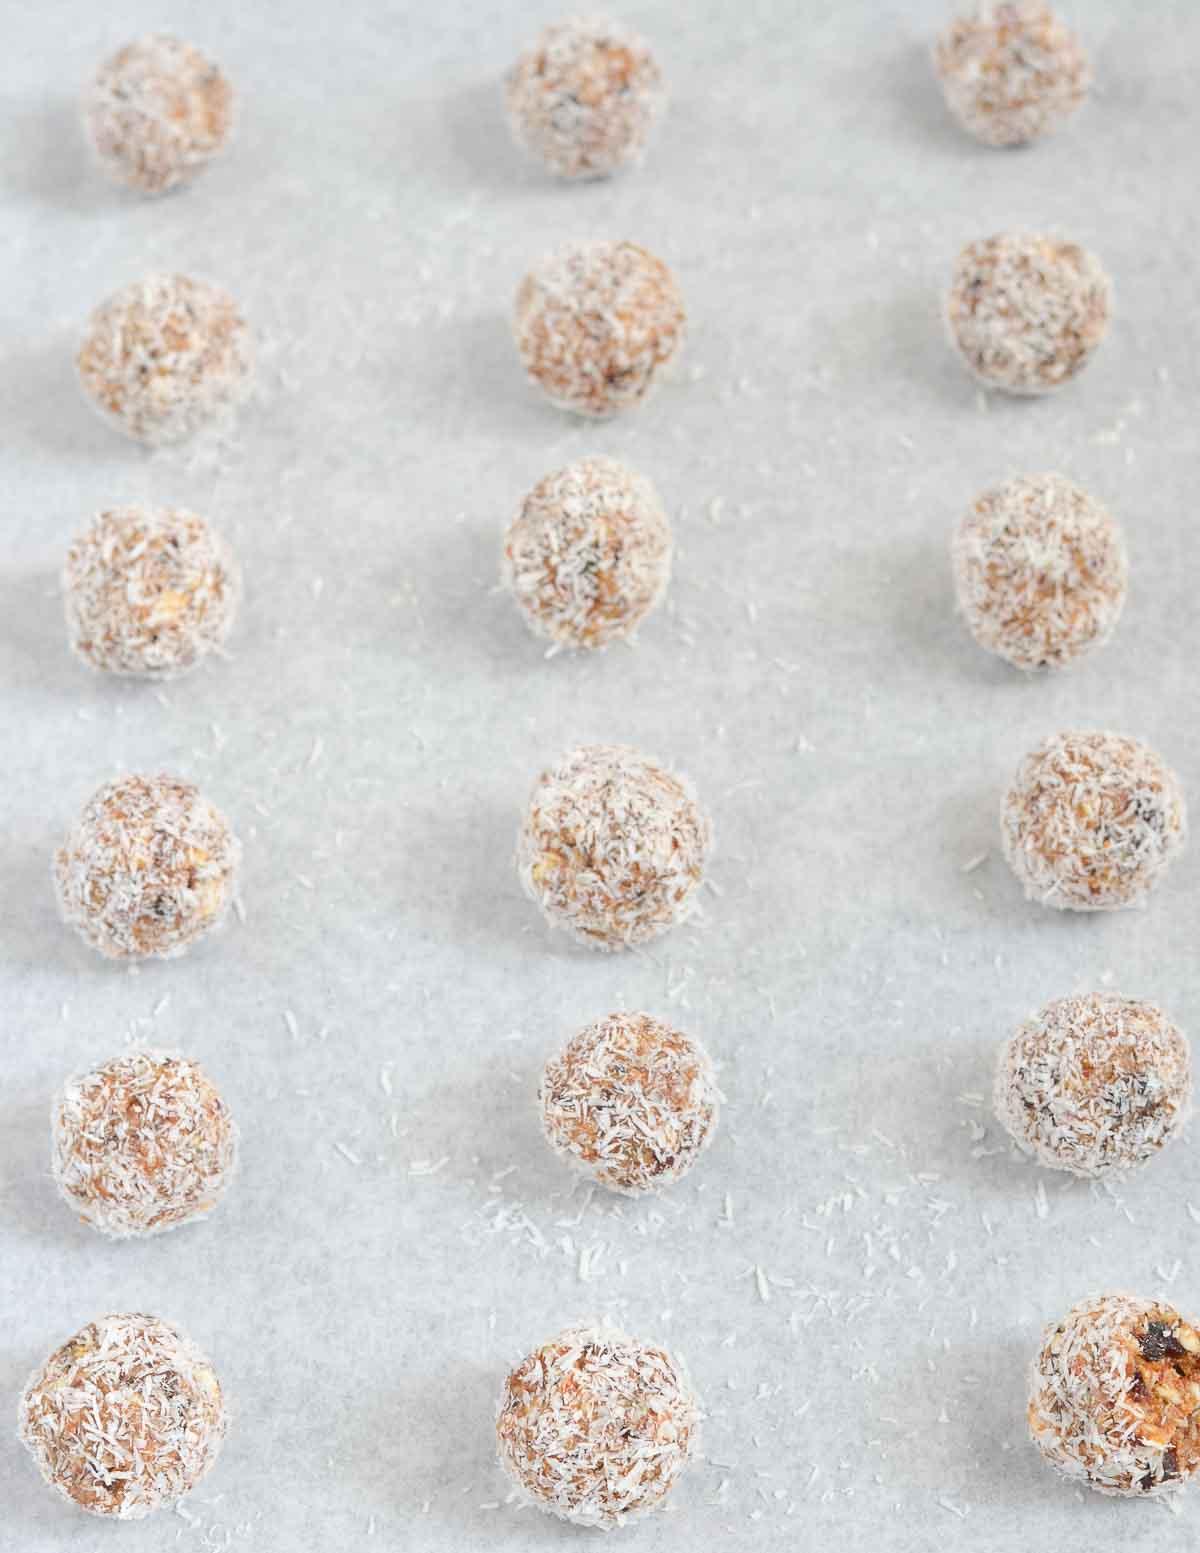 Salted Caramel Protein Bliss Bites